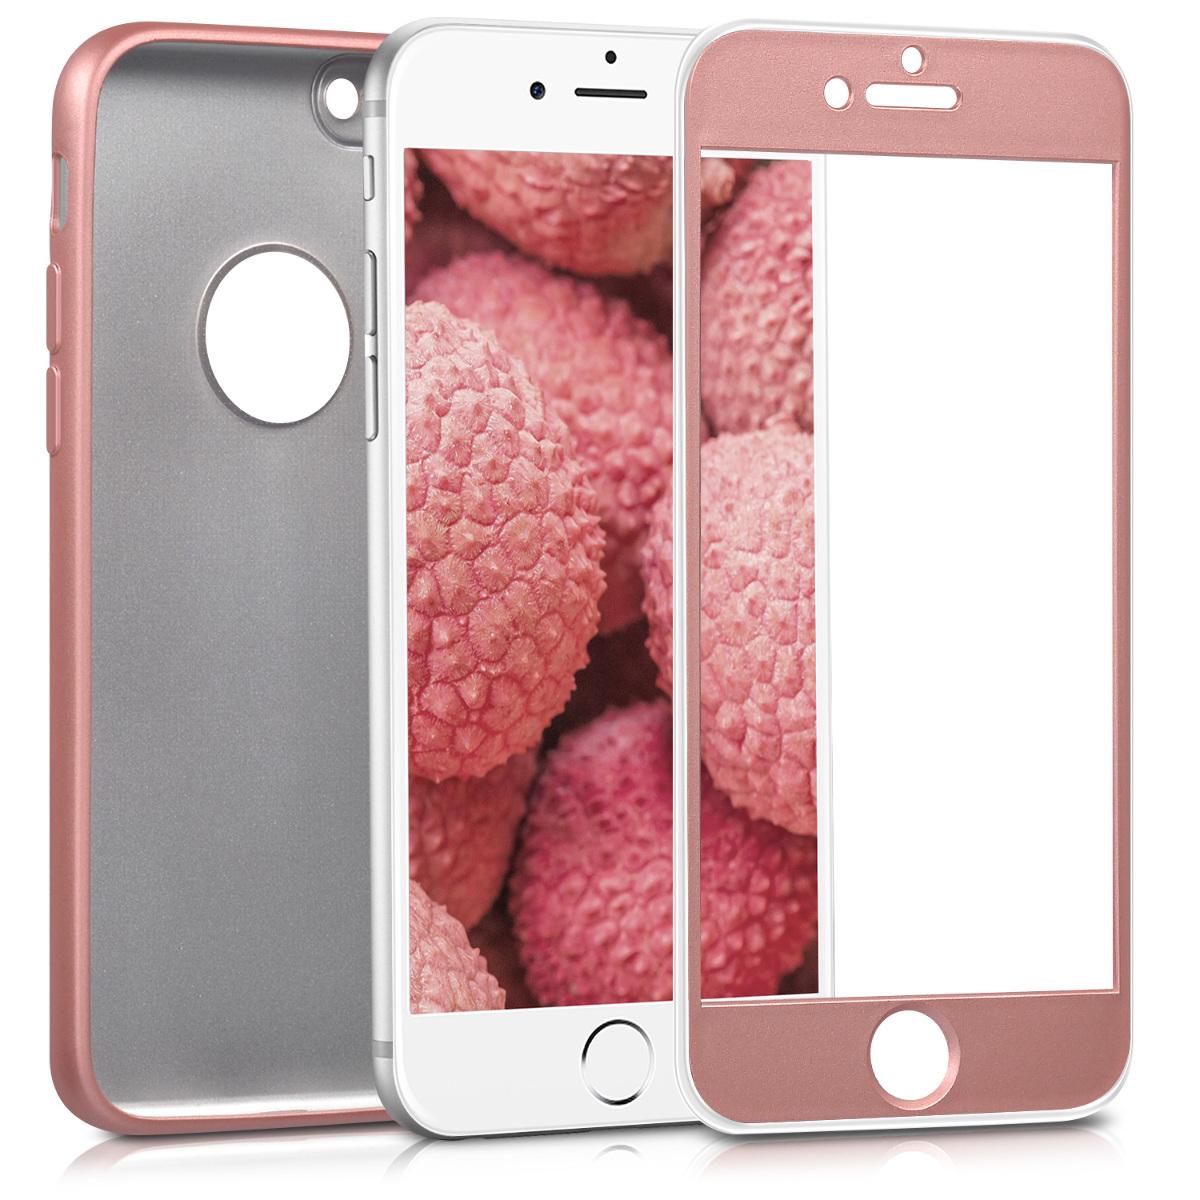 KW Θήκη Σιλικόνης Full Body iPhone 7 / 8 -  Metallic Rose Gold (42646.31)